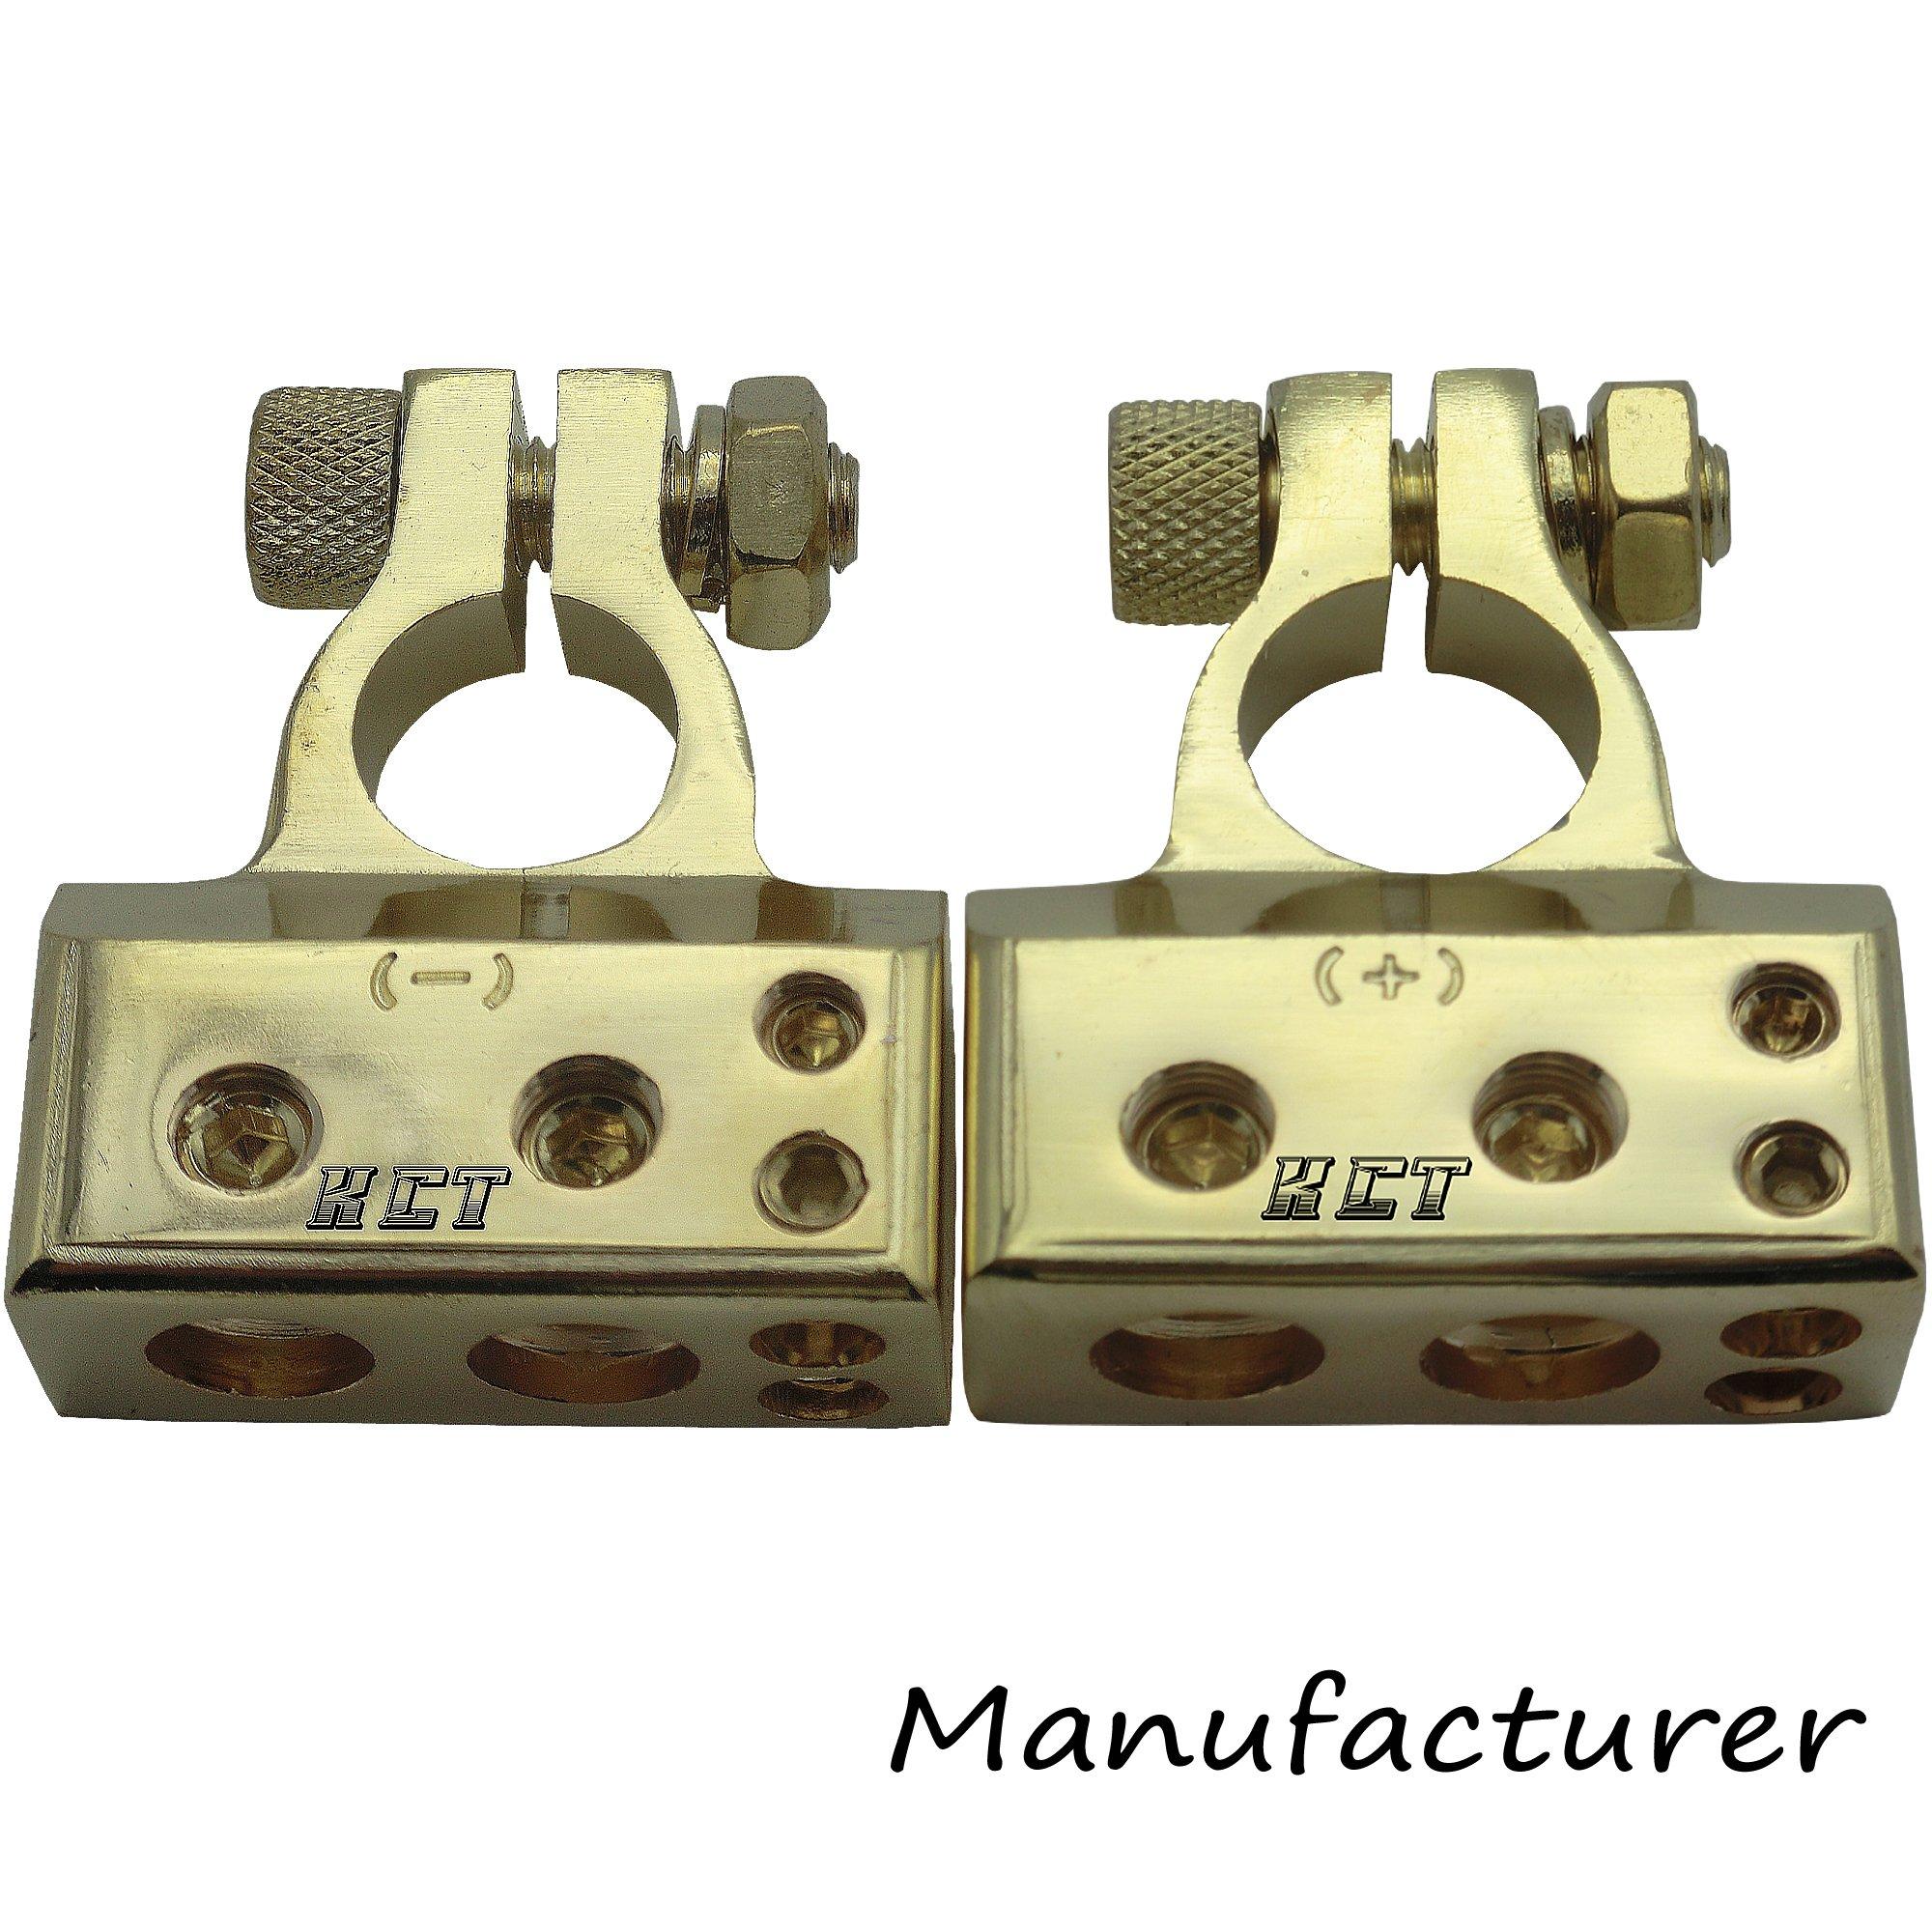 2pcs Battery Terminal 2x4ga+2x8ga Positive Negative Gold Auto Car Audio Modification